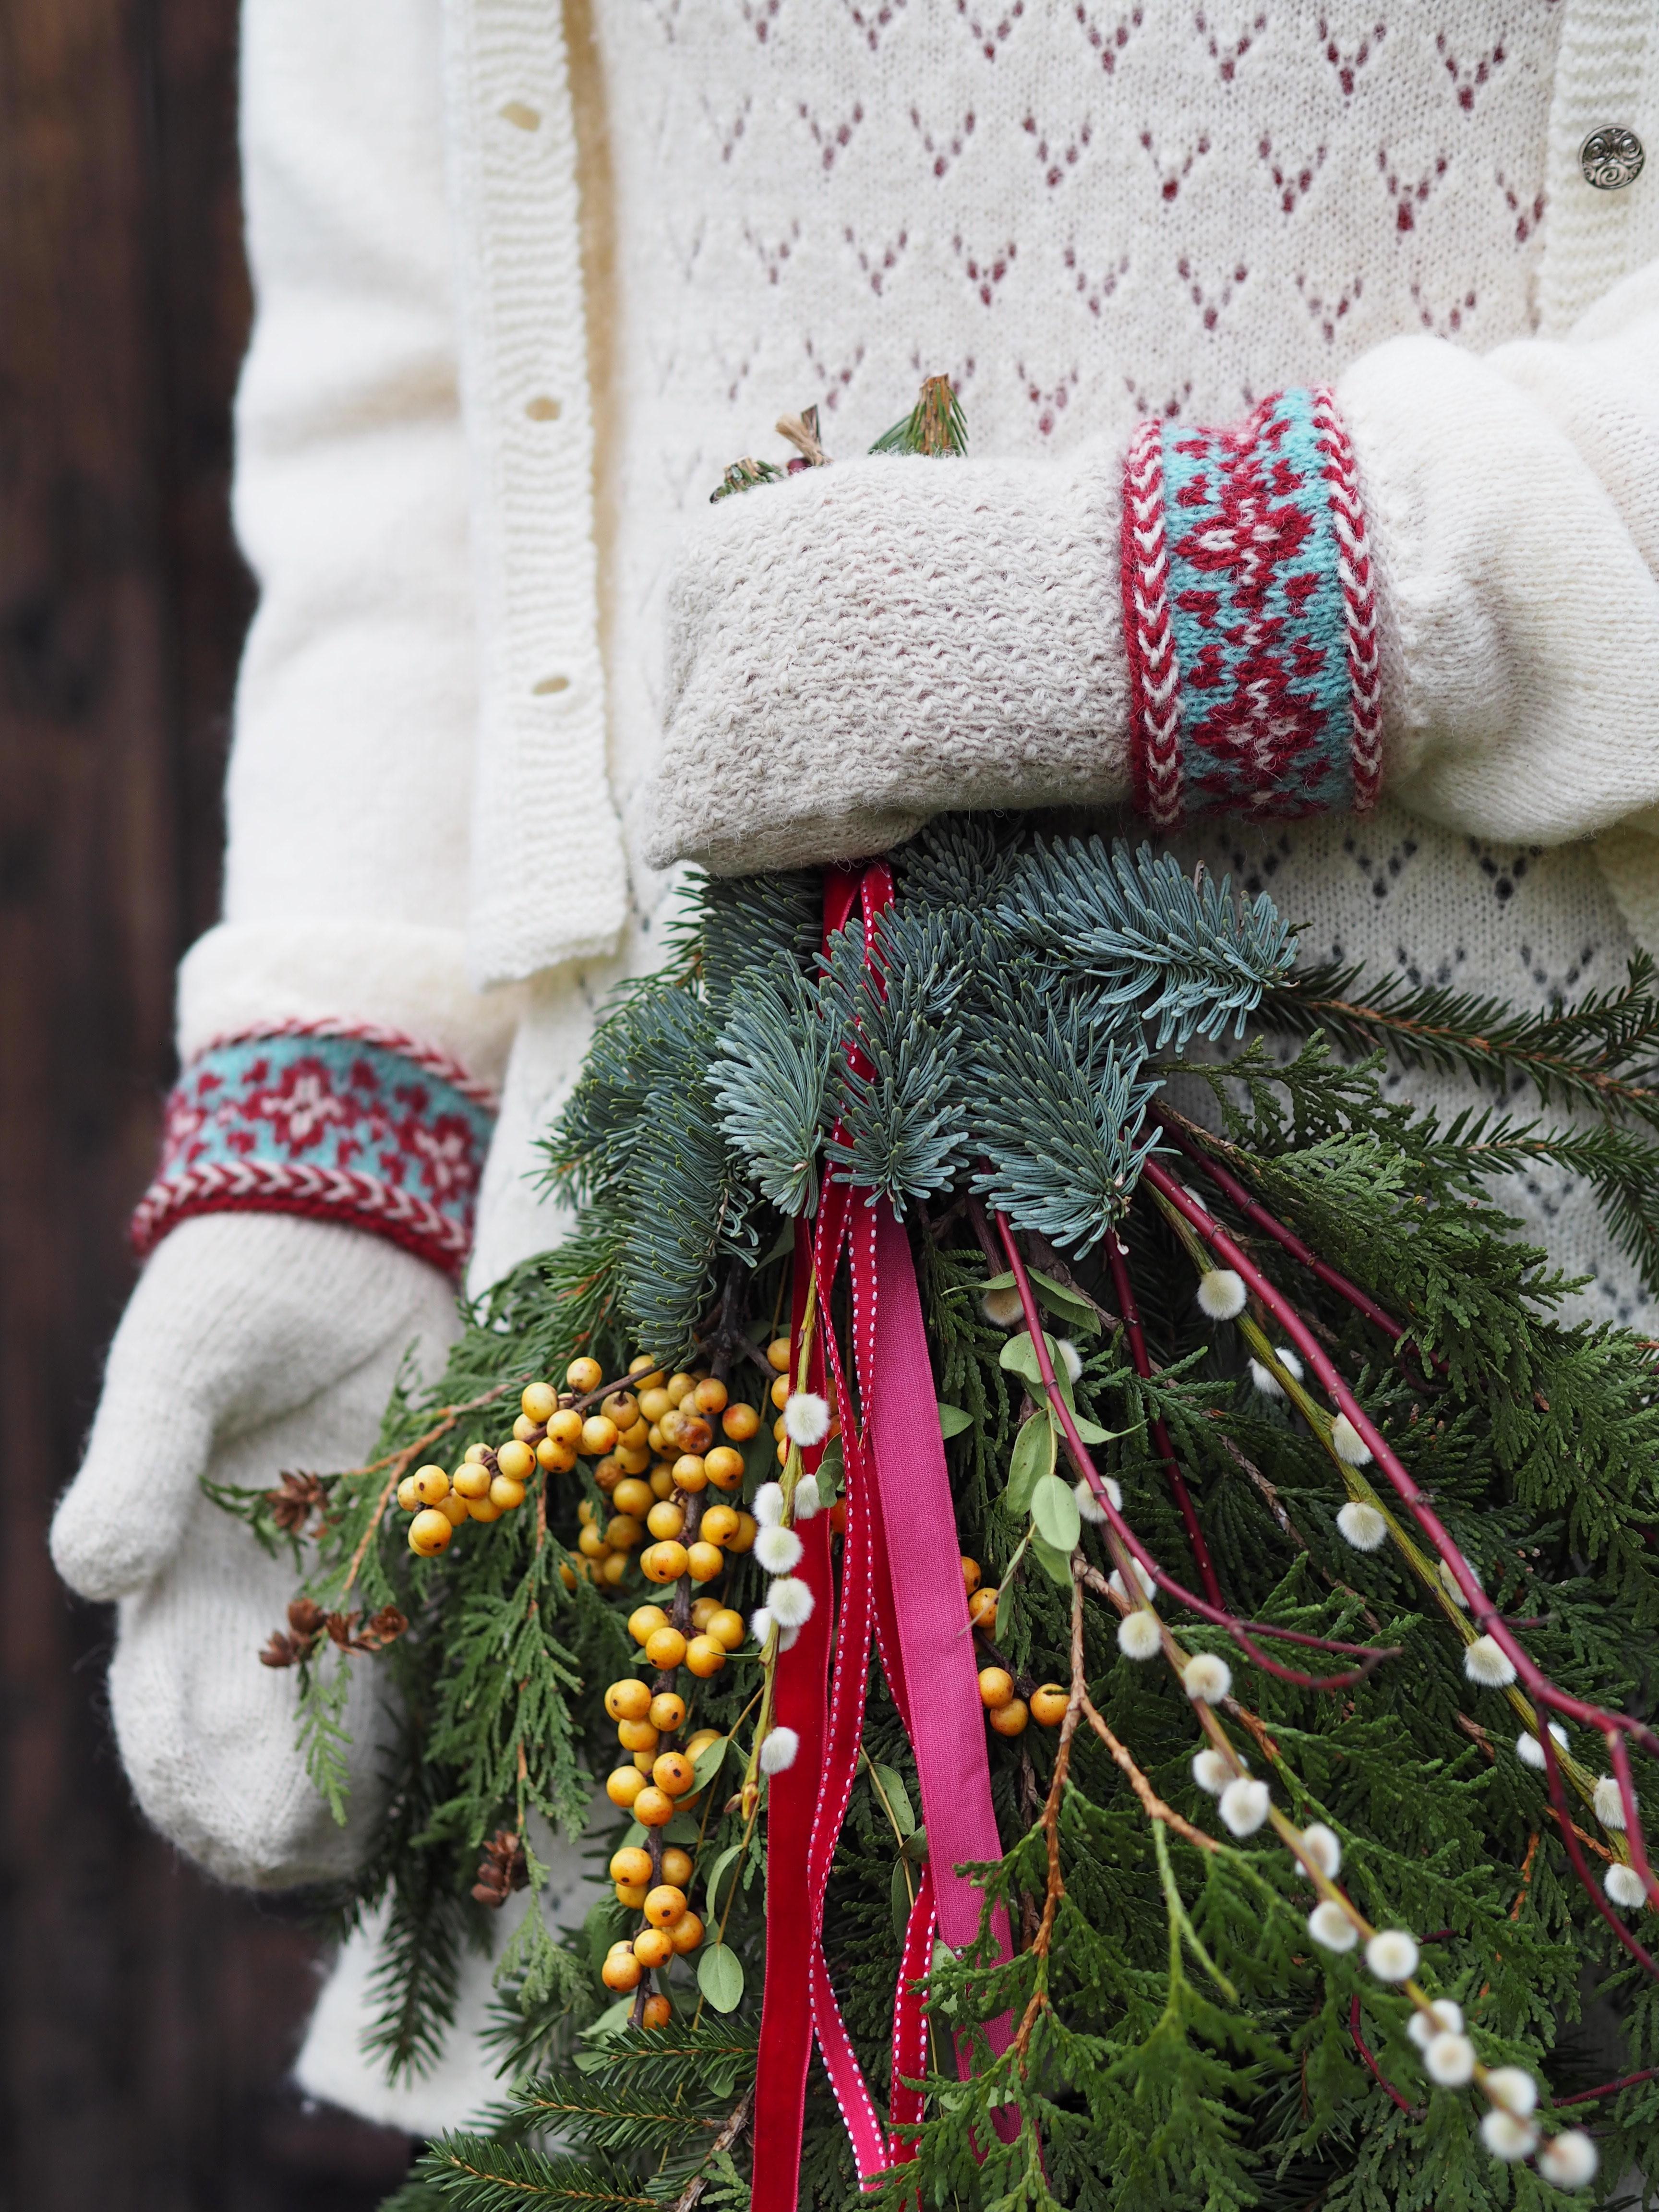 Christmas mittens 2019: Part 3